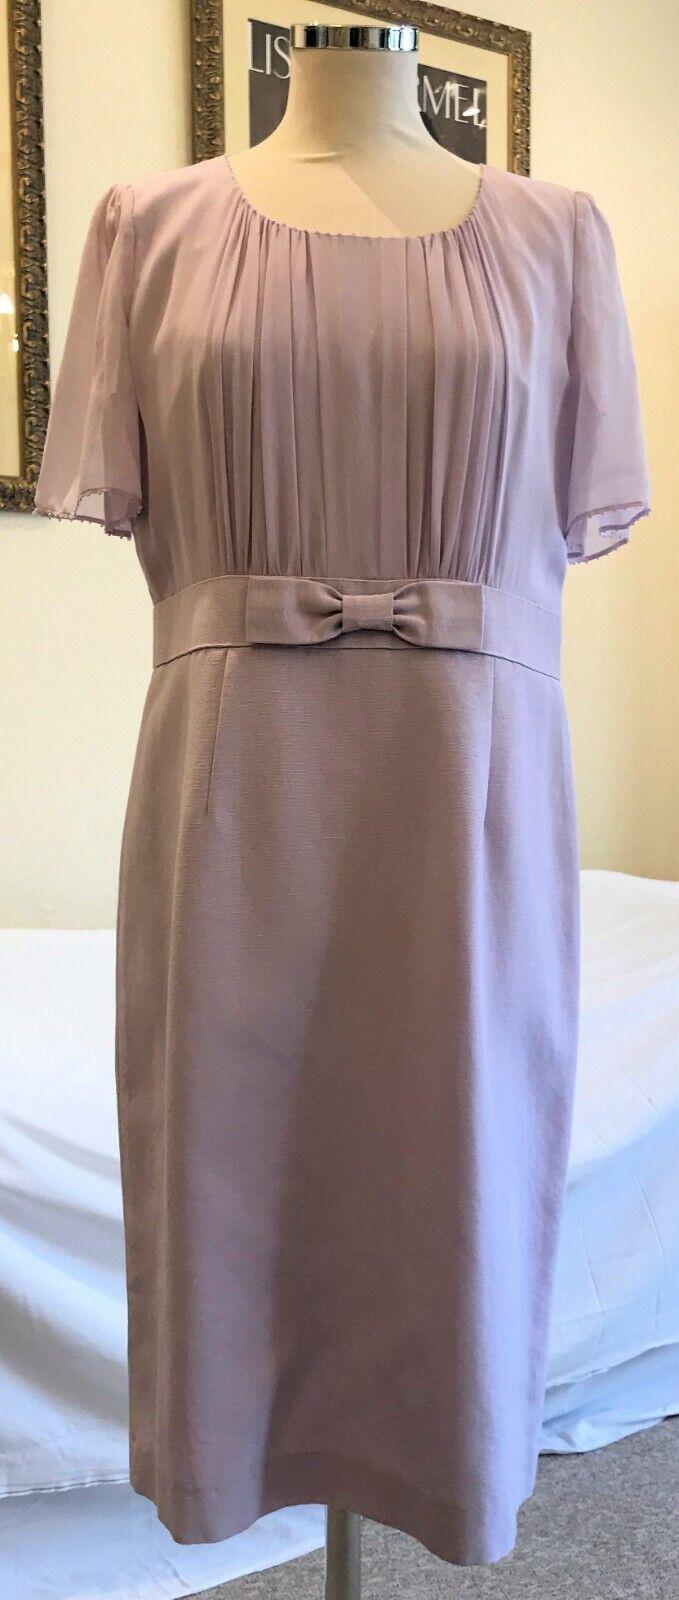 COUNTRY CASUALS Silk Chiffon & Cotton Blend Grosgrain Dress, UK 12, Mauve